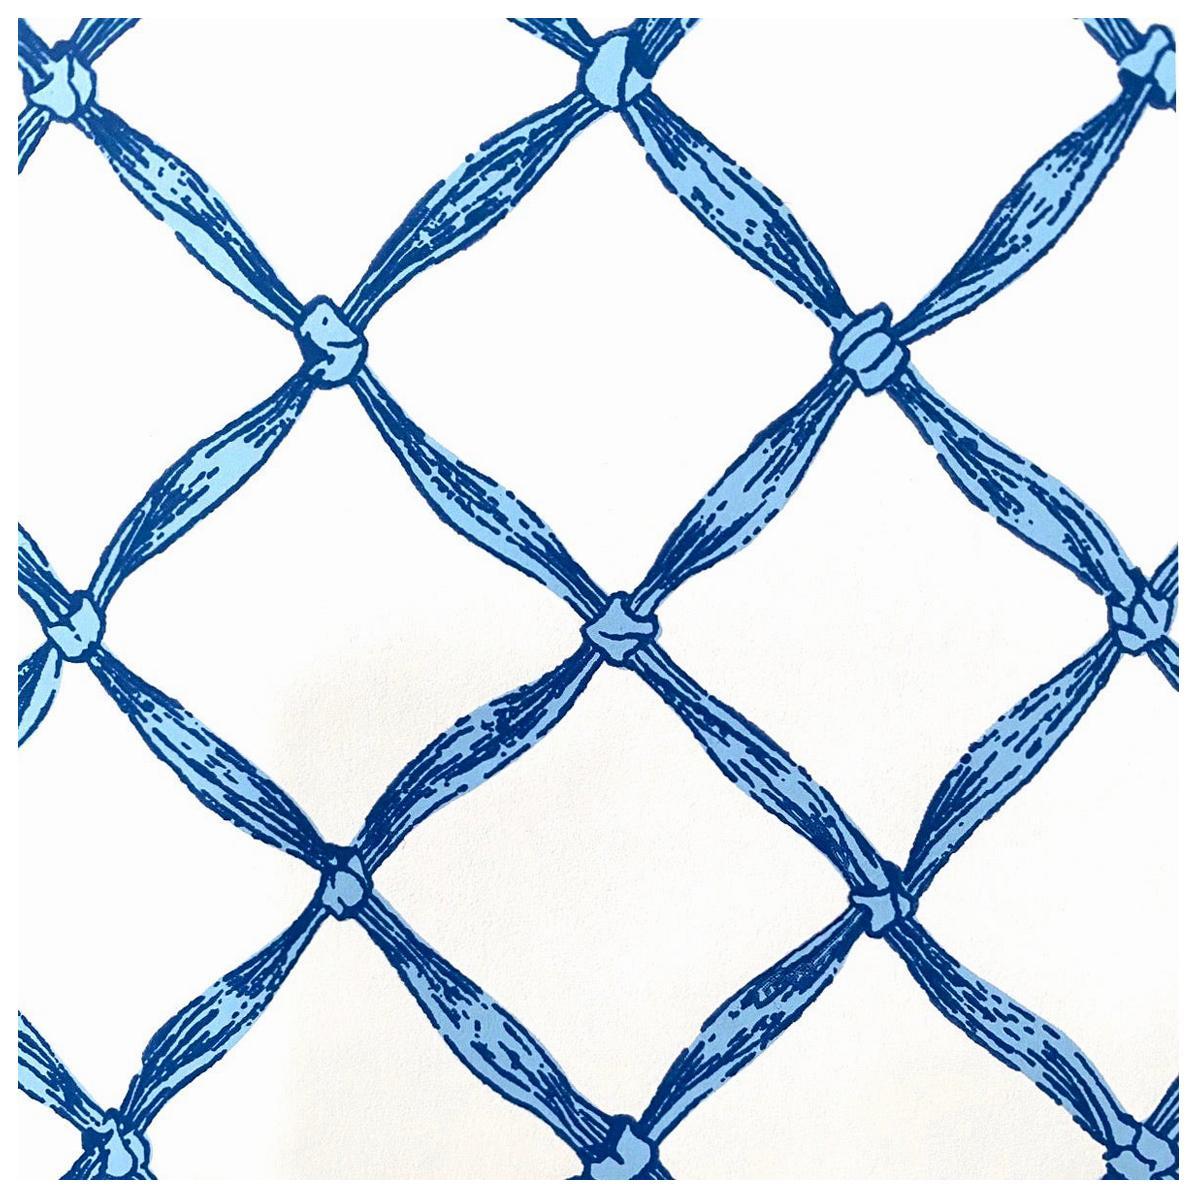 Vintage Scalamandre Trompe L'Oeil Normandy Blue Ribbon, French Wallpaper, 1986